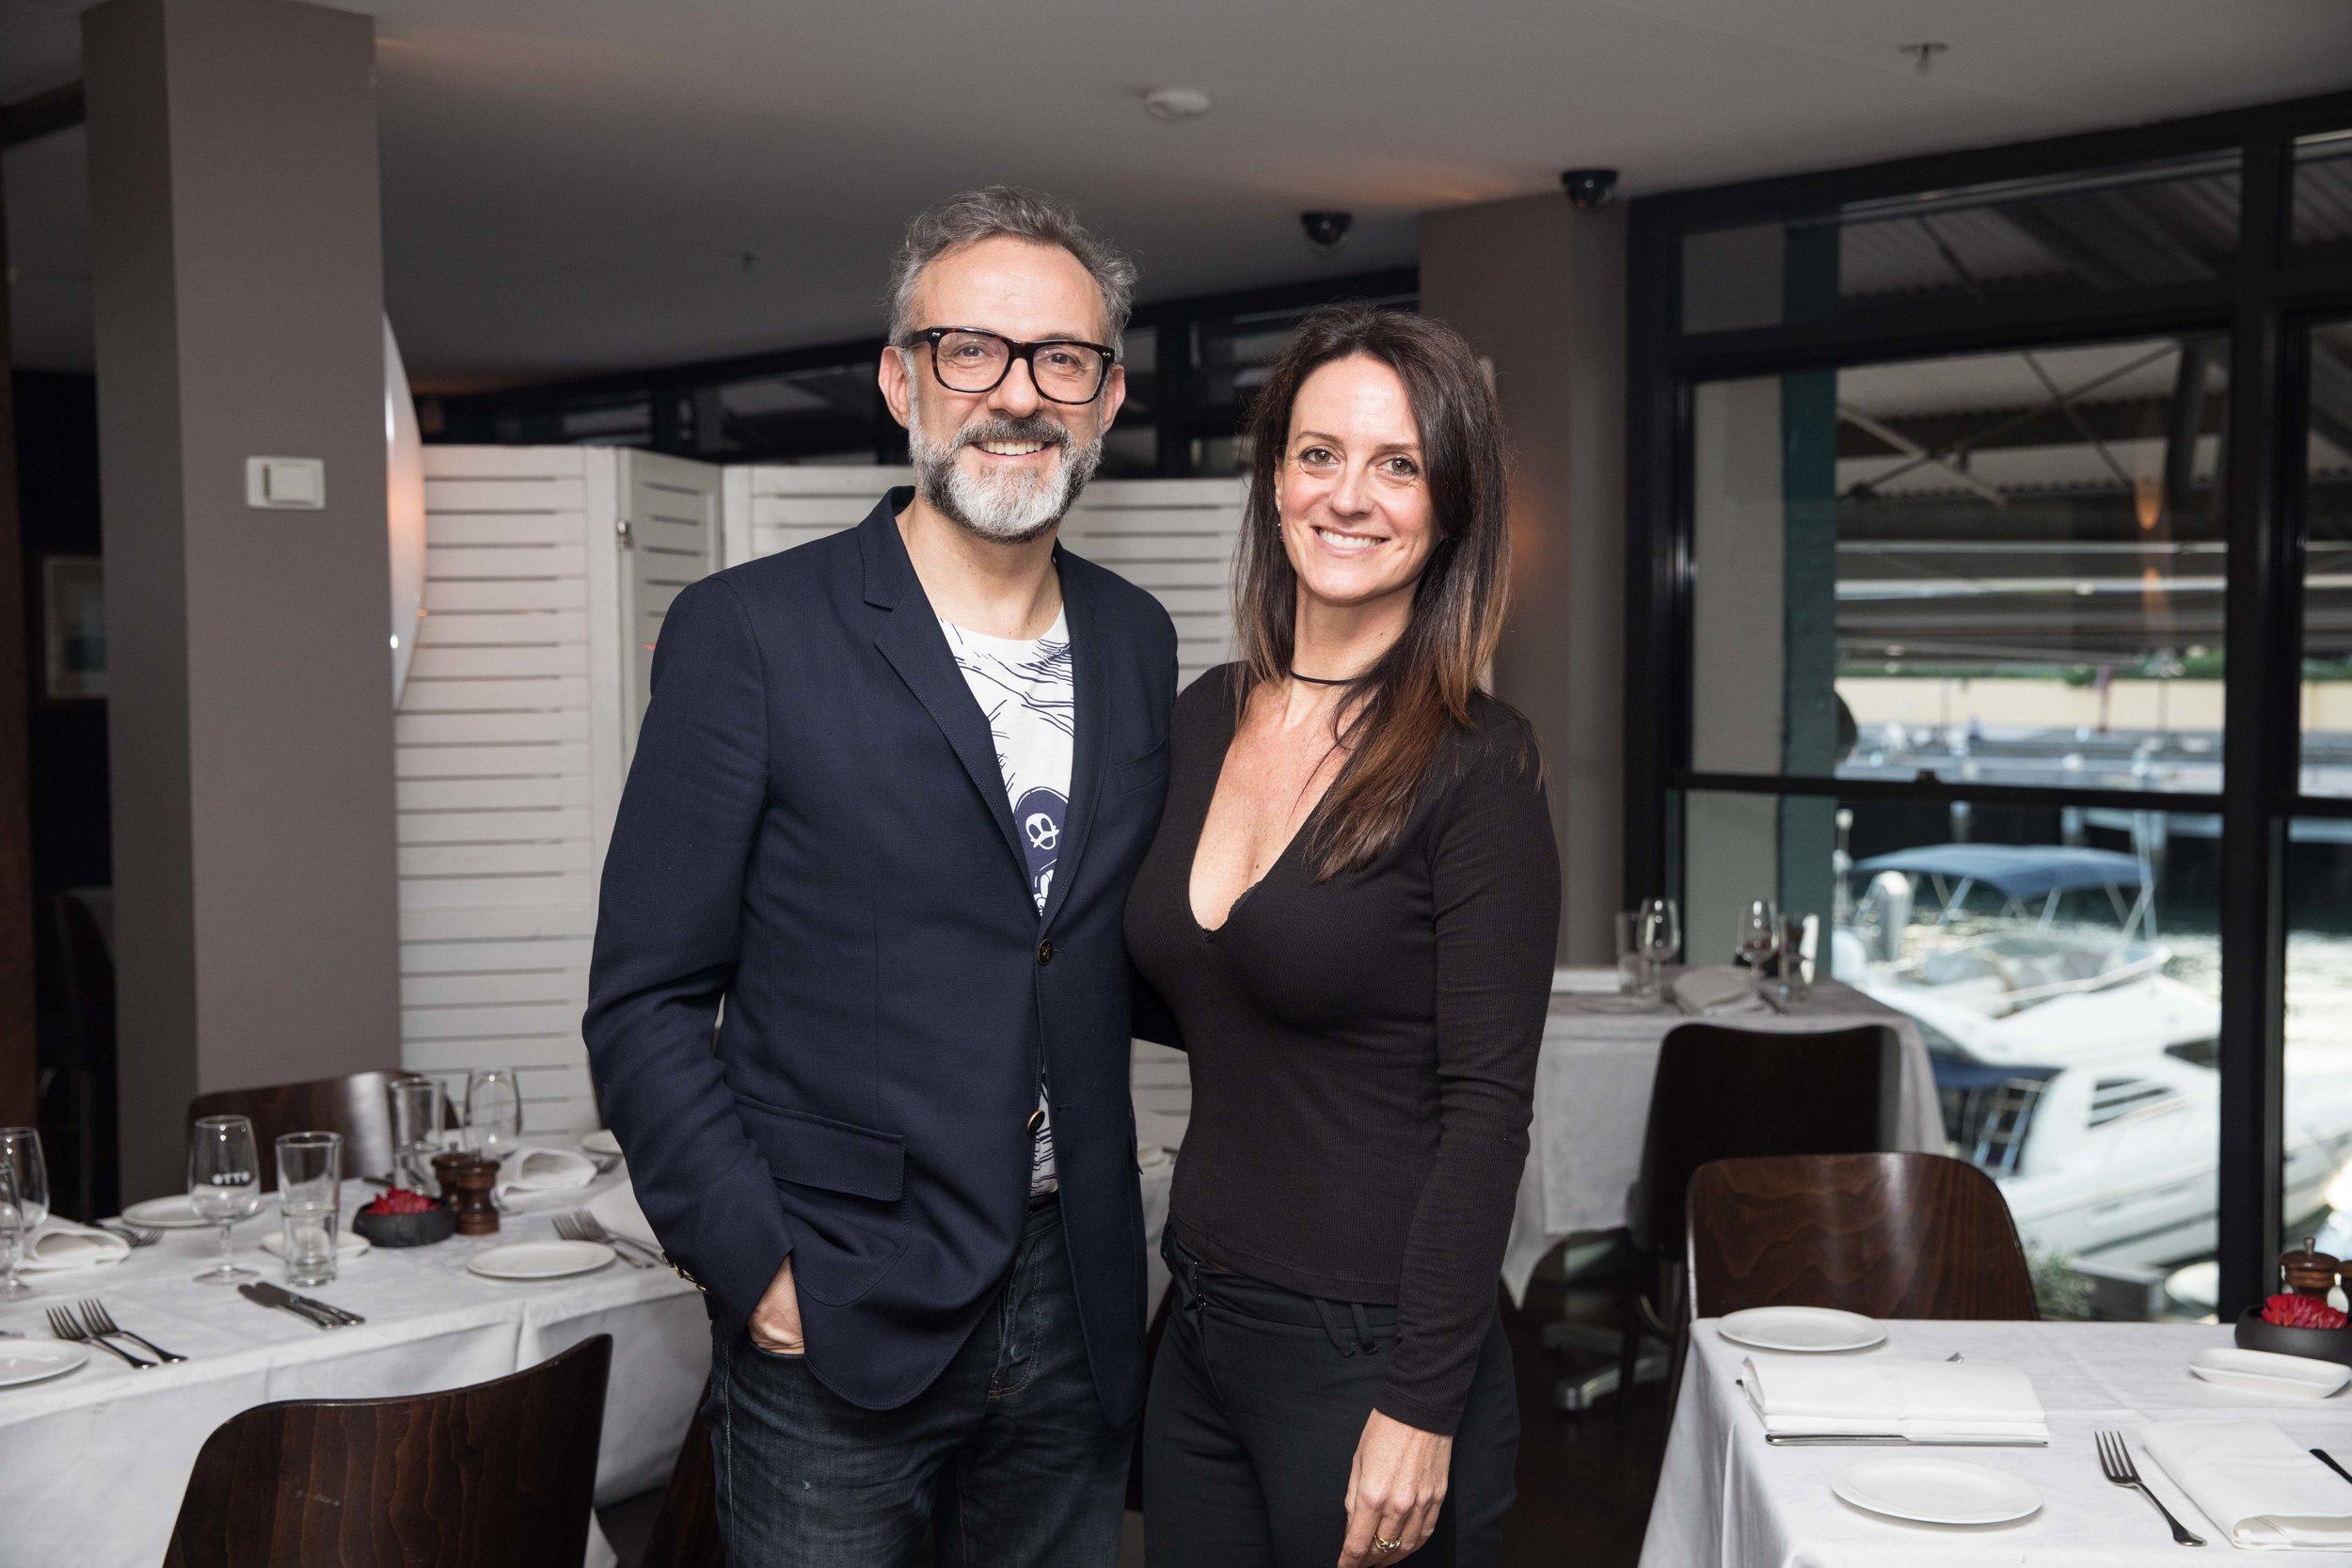 lavazza-massimo-bottura-worlds-50-best-restaurants-awards-2017-georgia-cassimatis.jpg